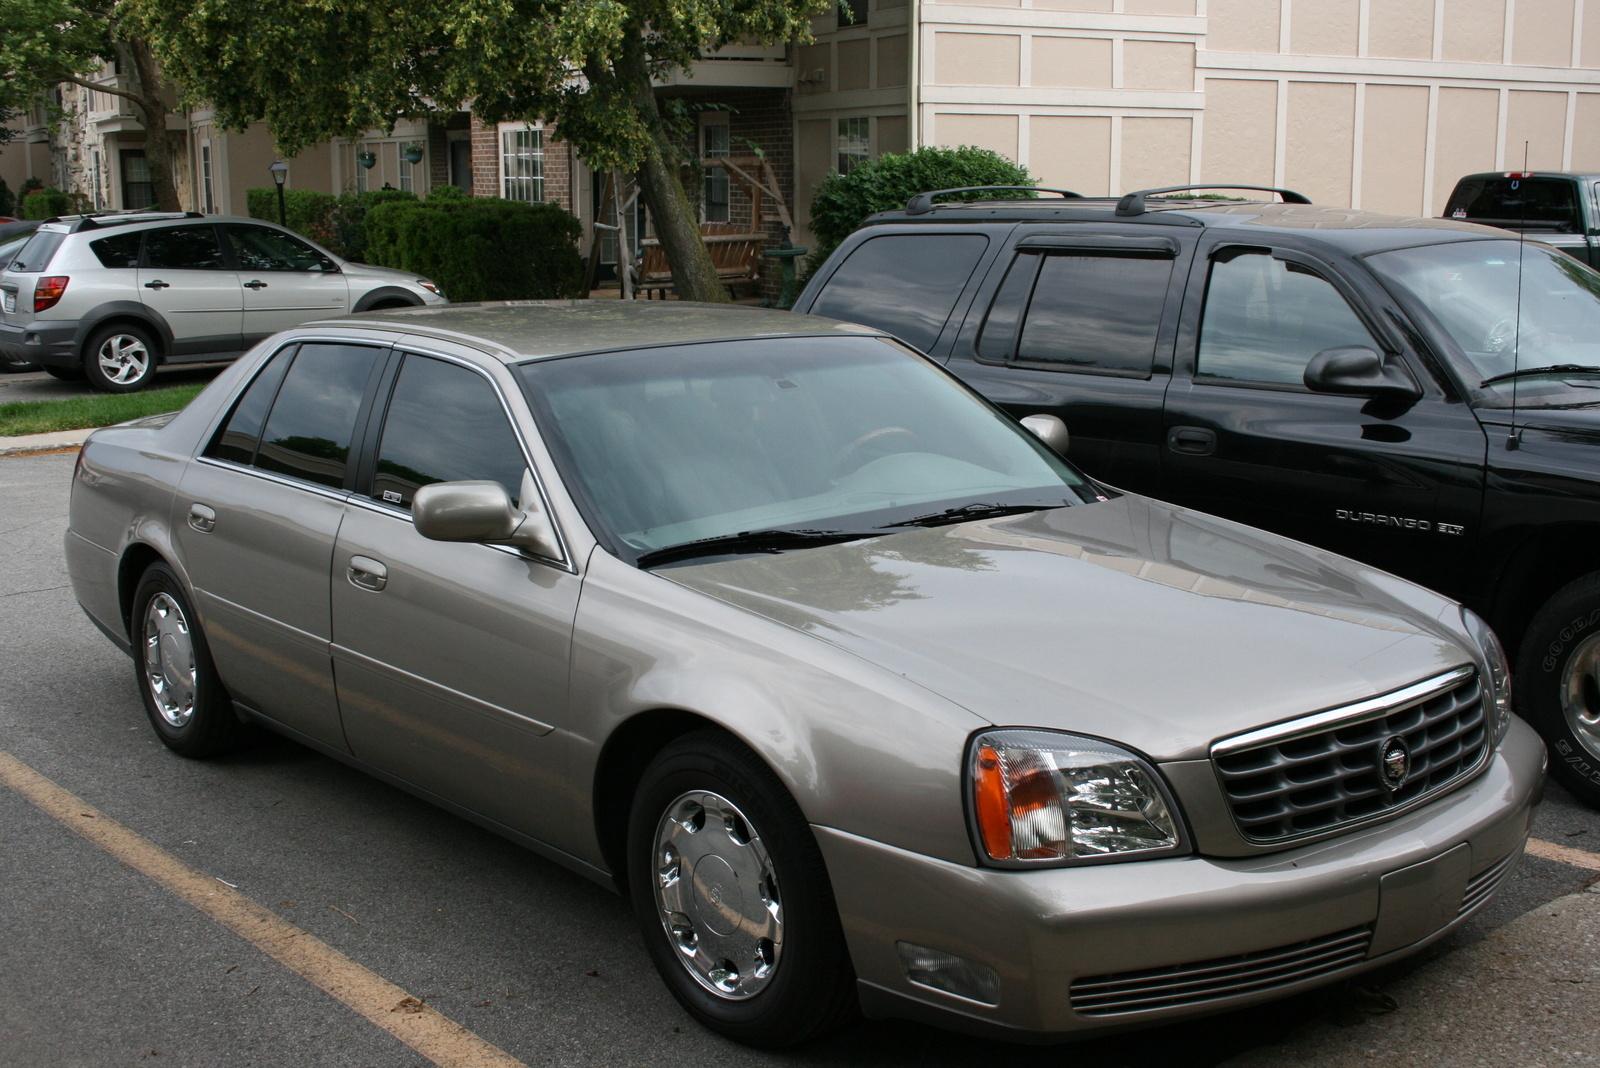 Toyota Avalon User Reviews CarGurus - 2001 avalon